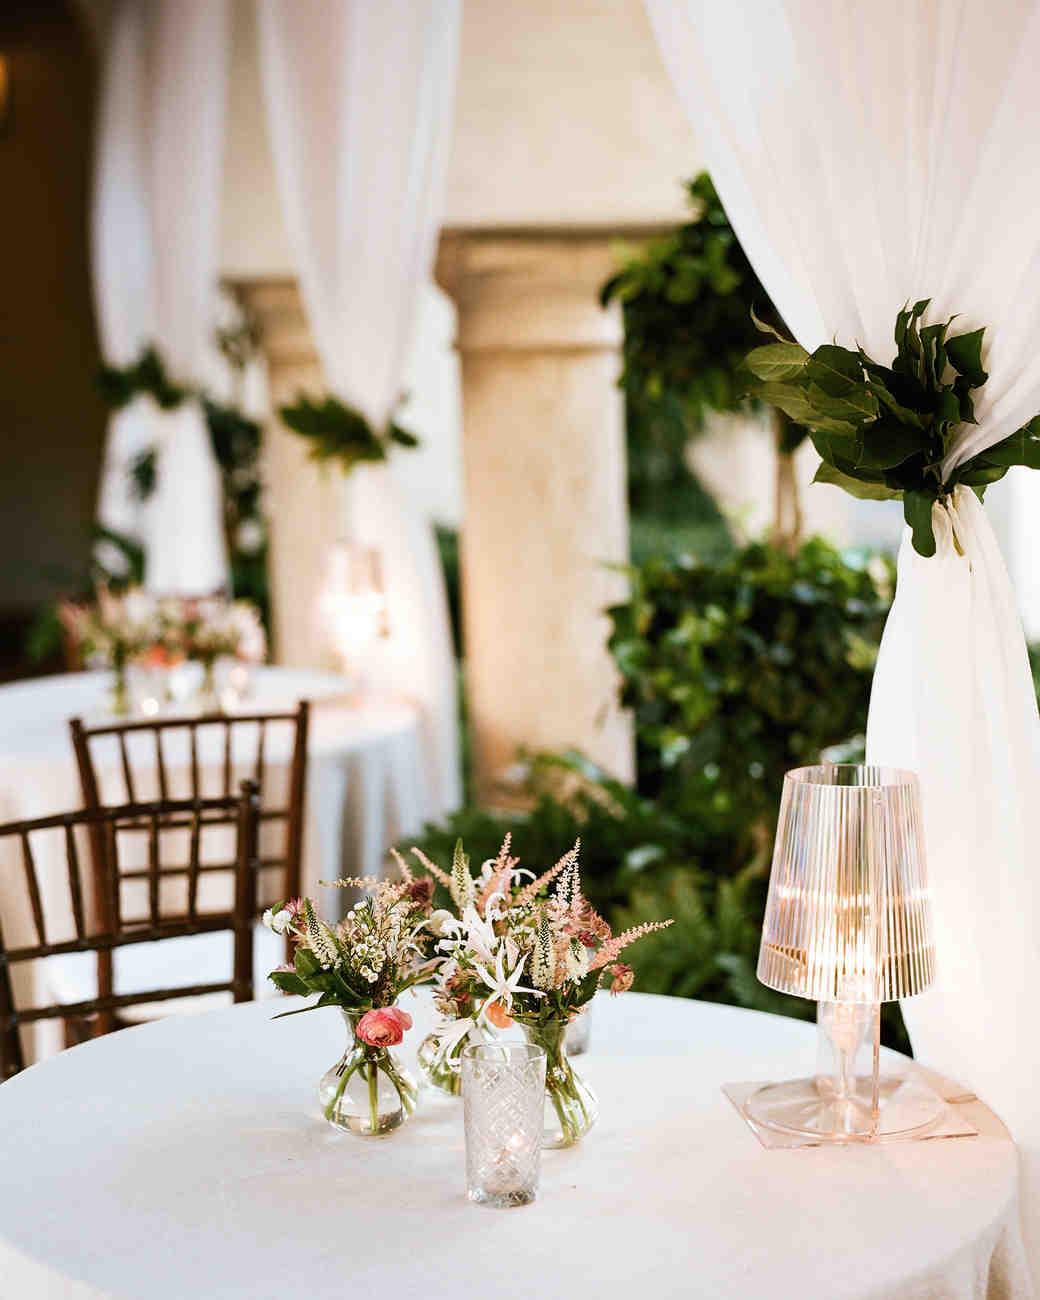 nancy-nathan-wedding-cocktail-hour-0876-6141569-0816.jpg